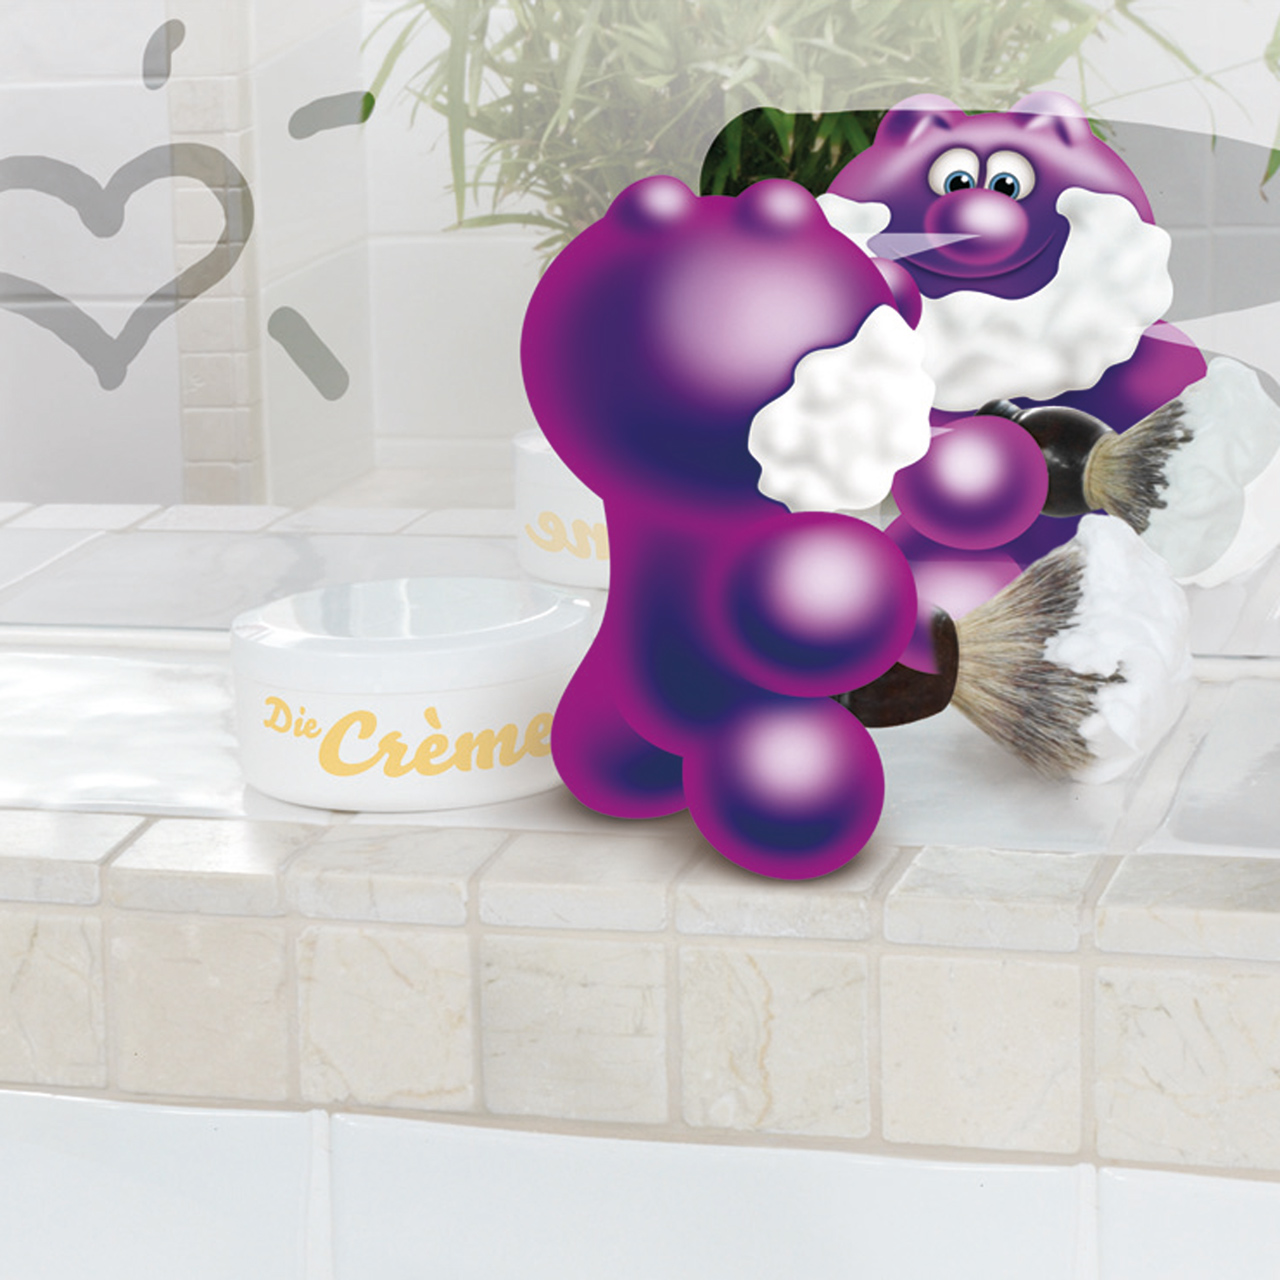 gelini character brand